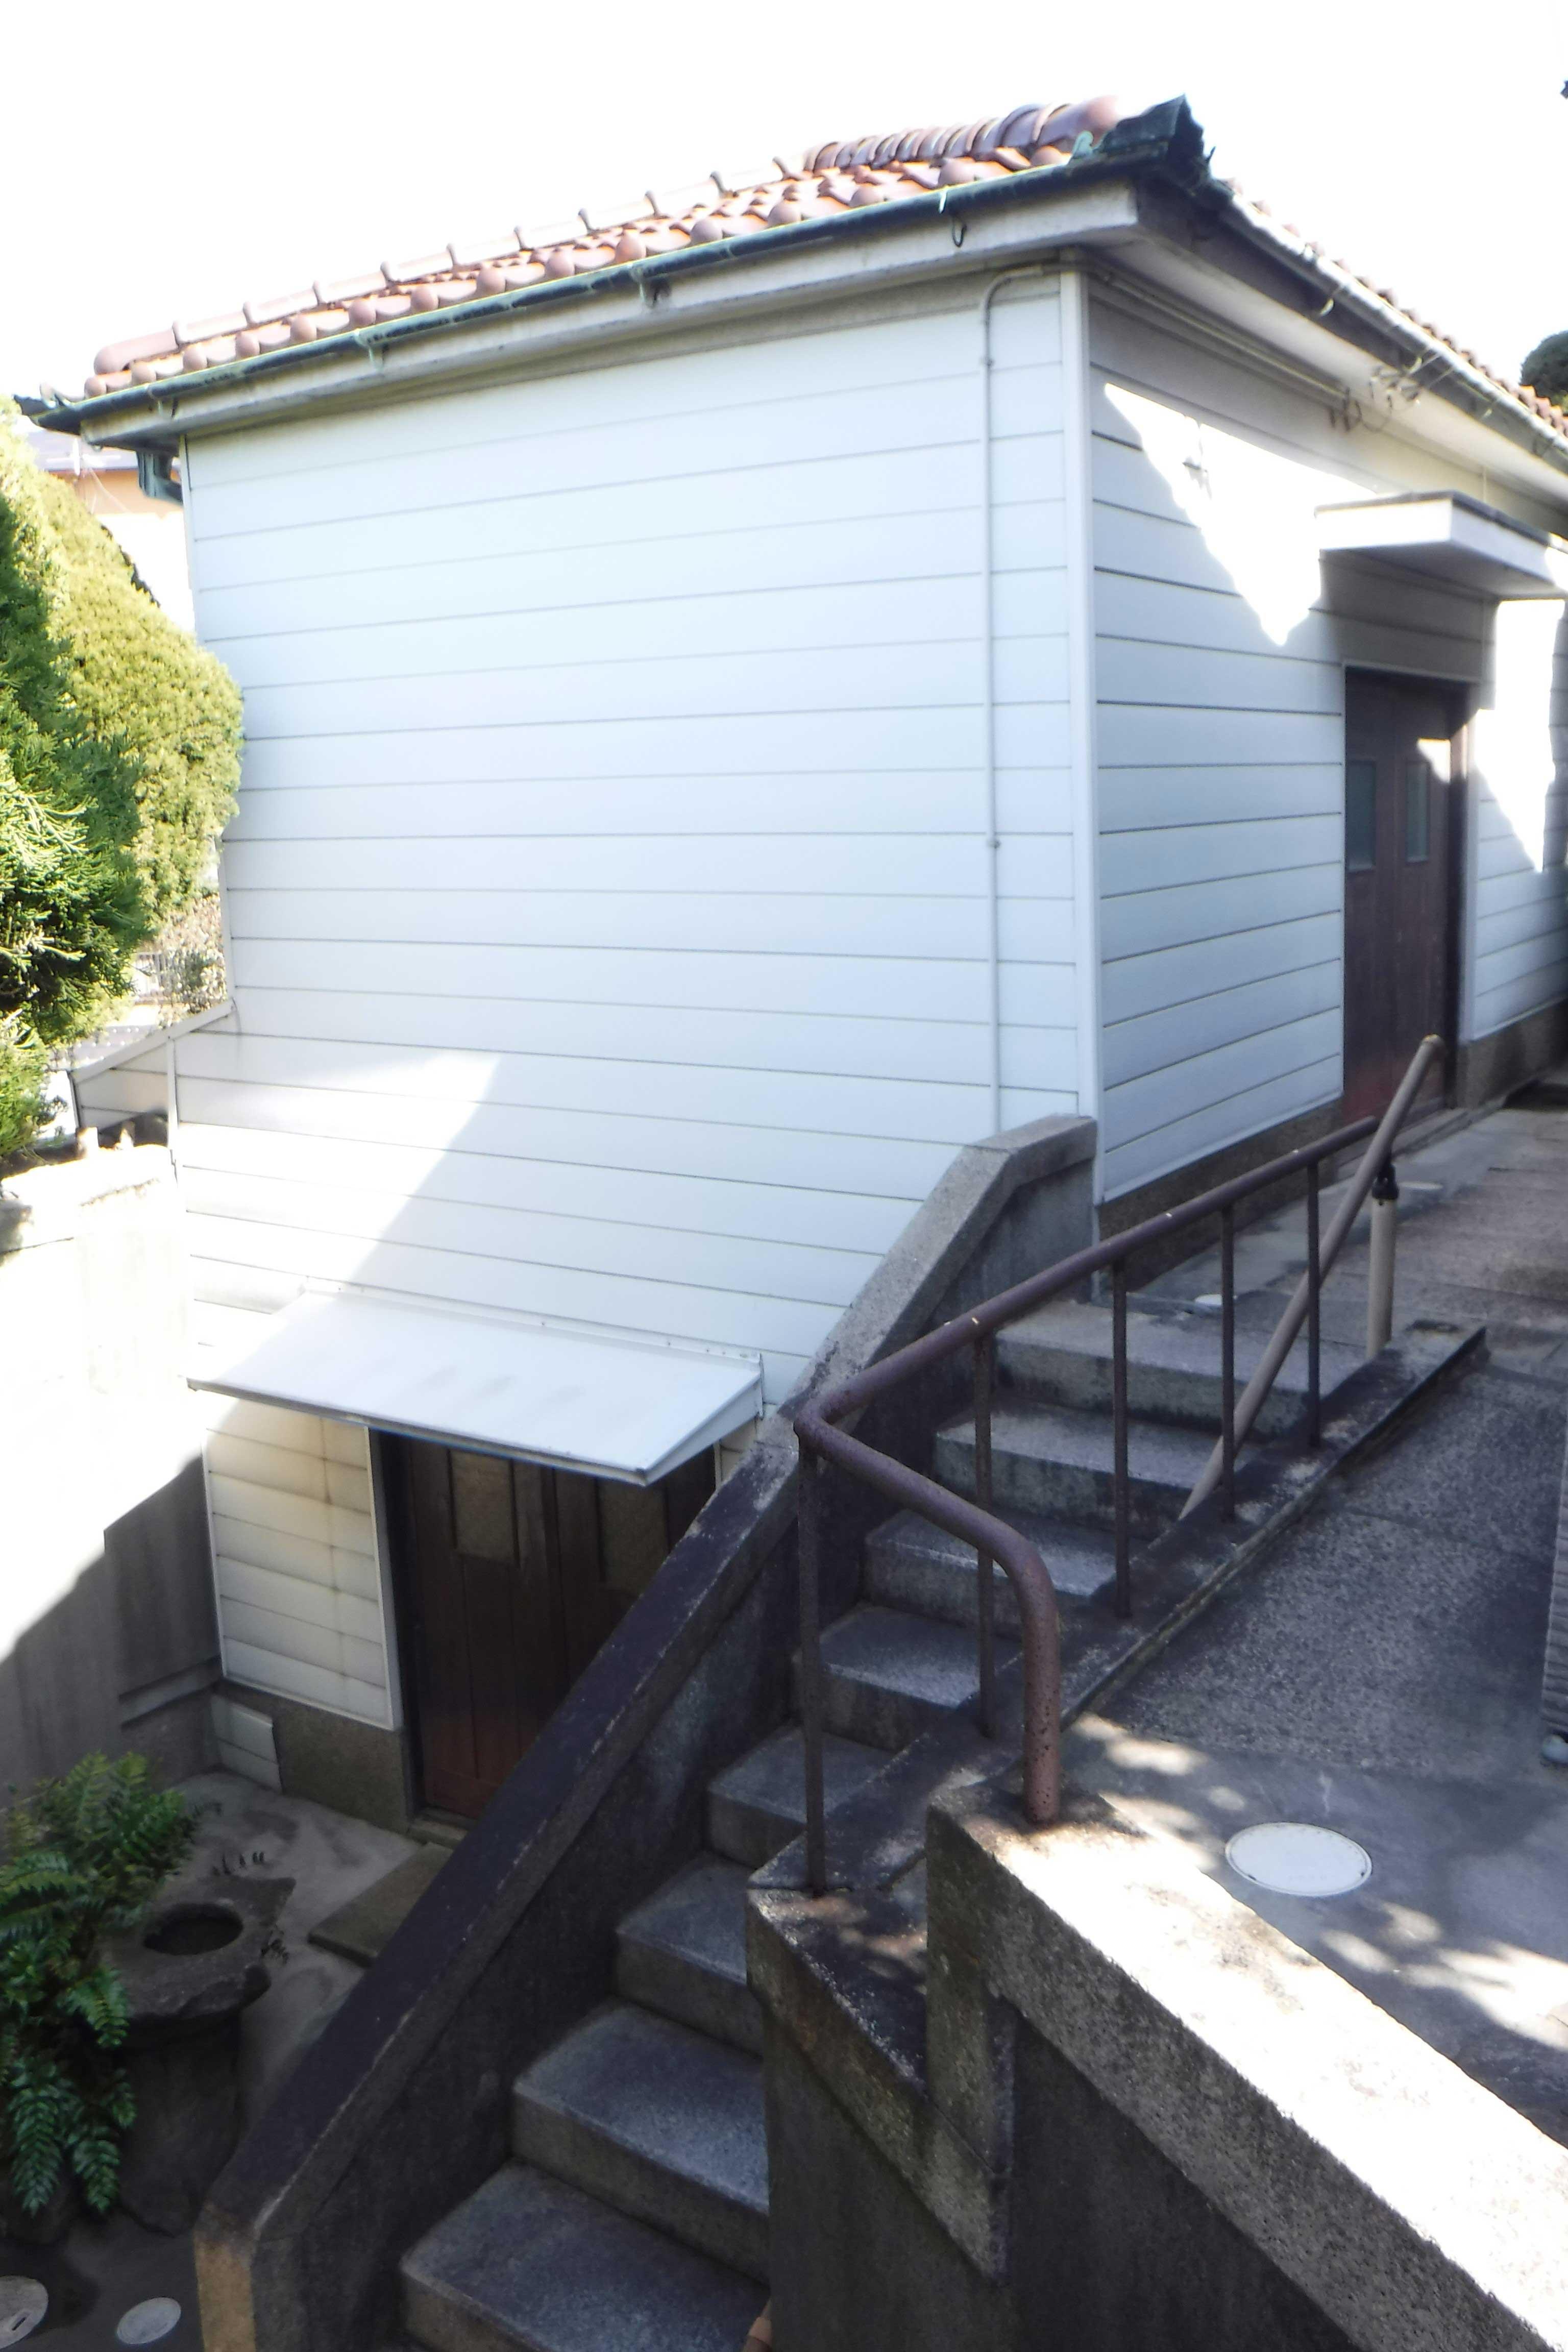 <p>納屋</p>1階西半と地階を納屋とし、1階東半は男衆部屋として押入を備える。旧家における使用人の生活を伝える。